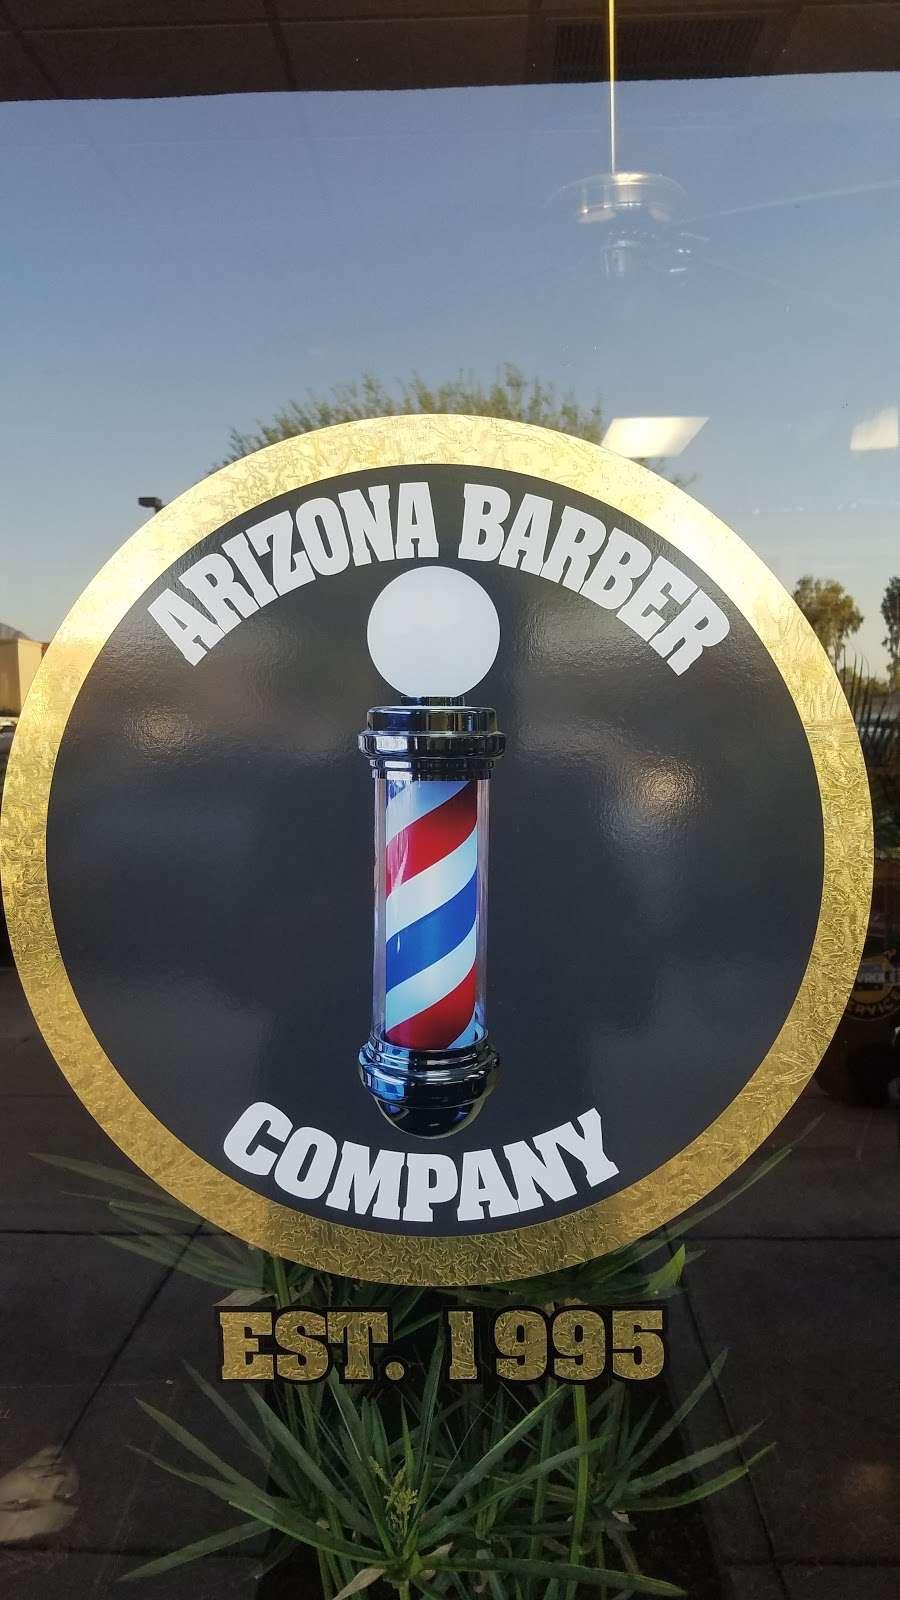 Arizona Barber Co - hair care  | Photo 3 of 10 | Address: 8880 E Vía Linda # 103, Scottsdale, AZ 85258, USA | Phone: (480) 860-4650